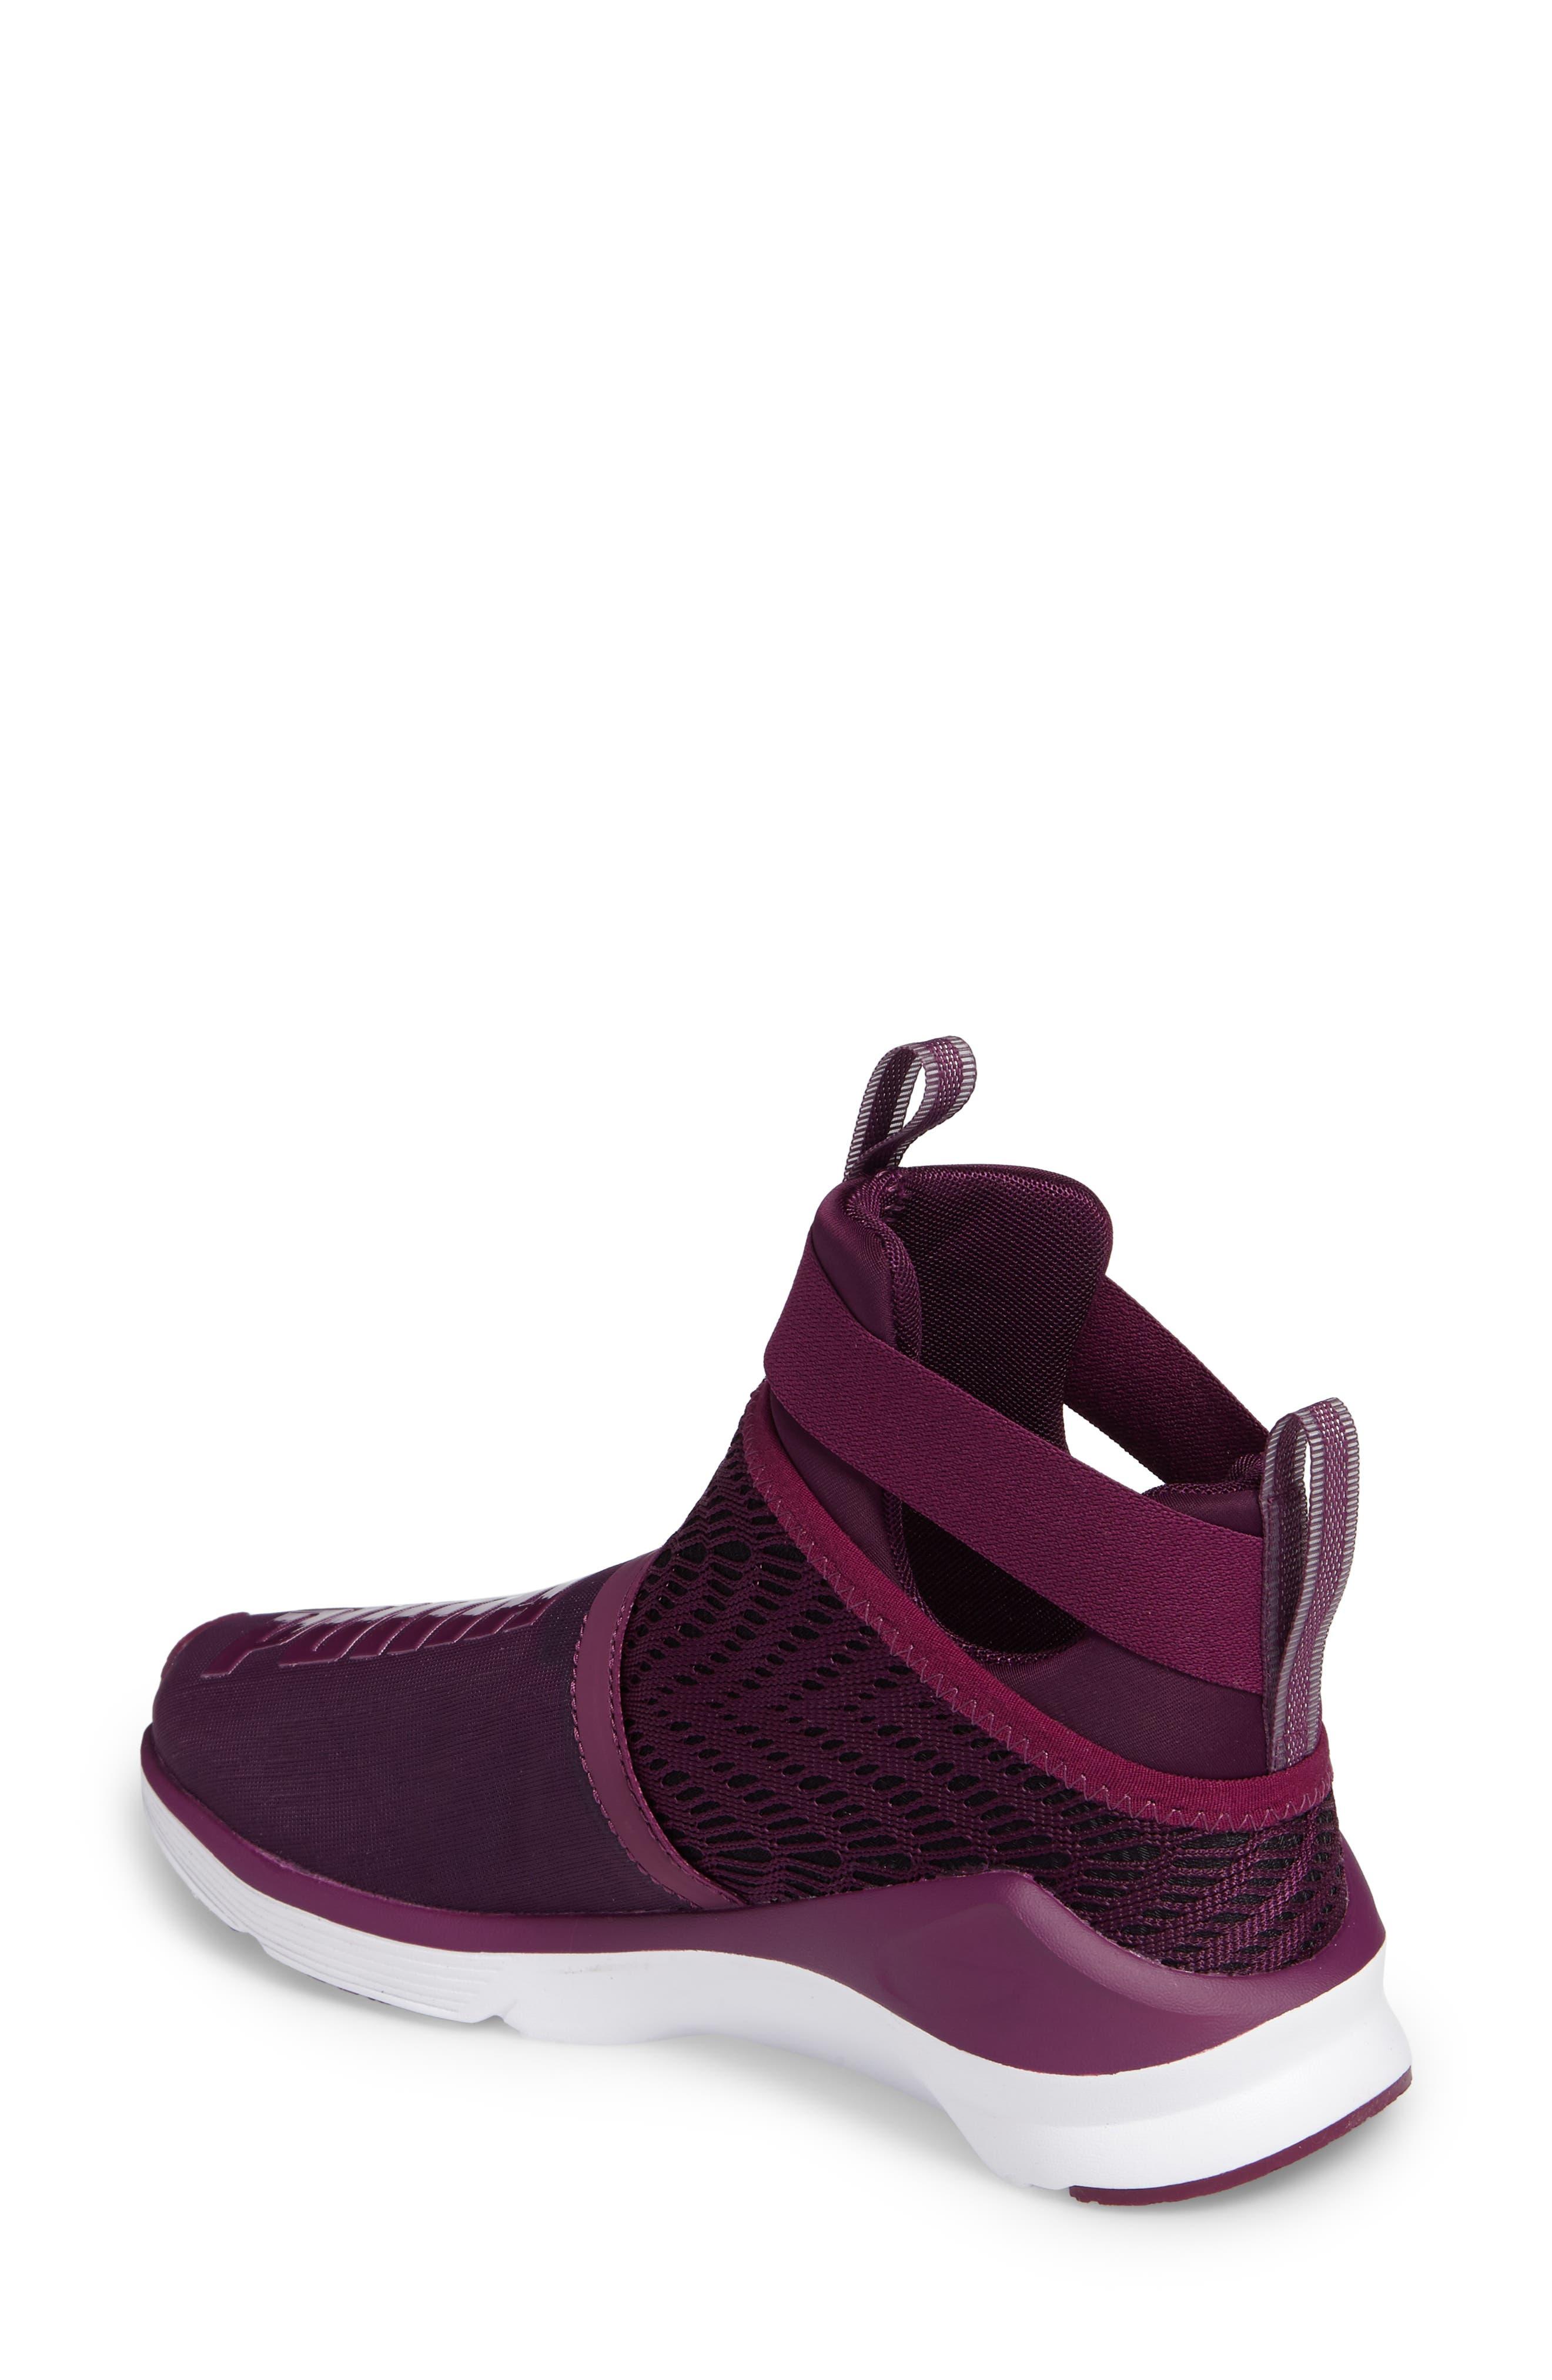 Fierce Strap Training Sneaker,                             Alternate thumbnail 15, color,